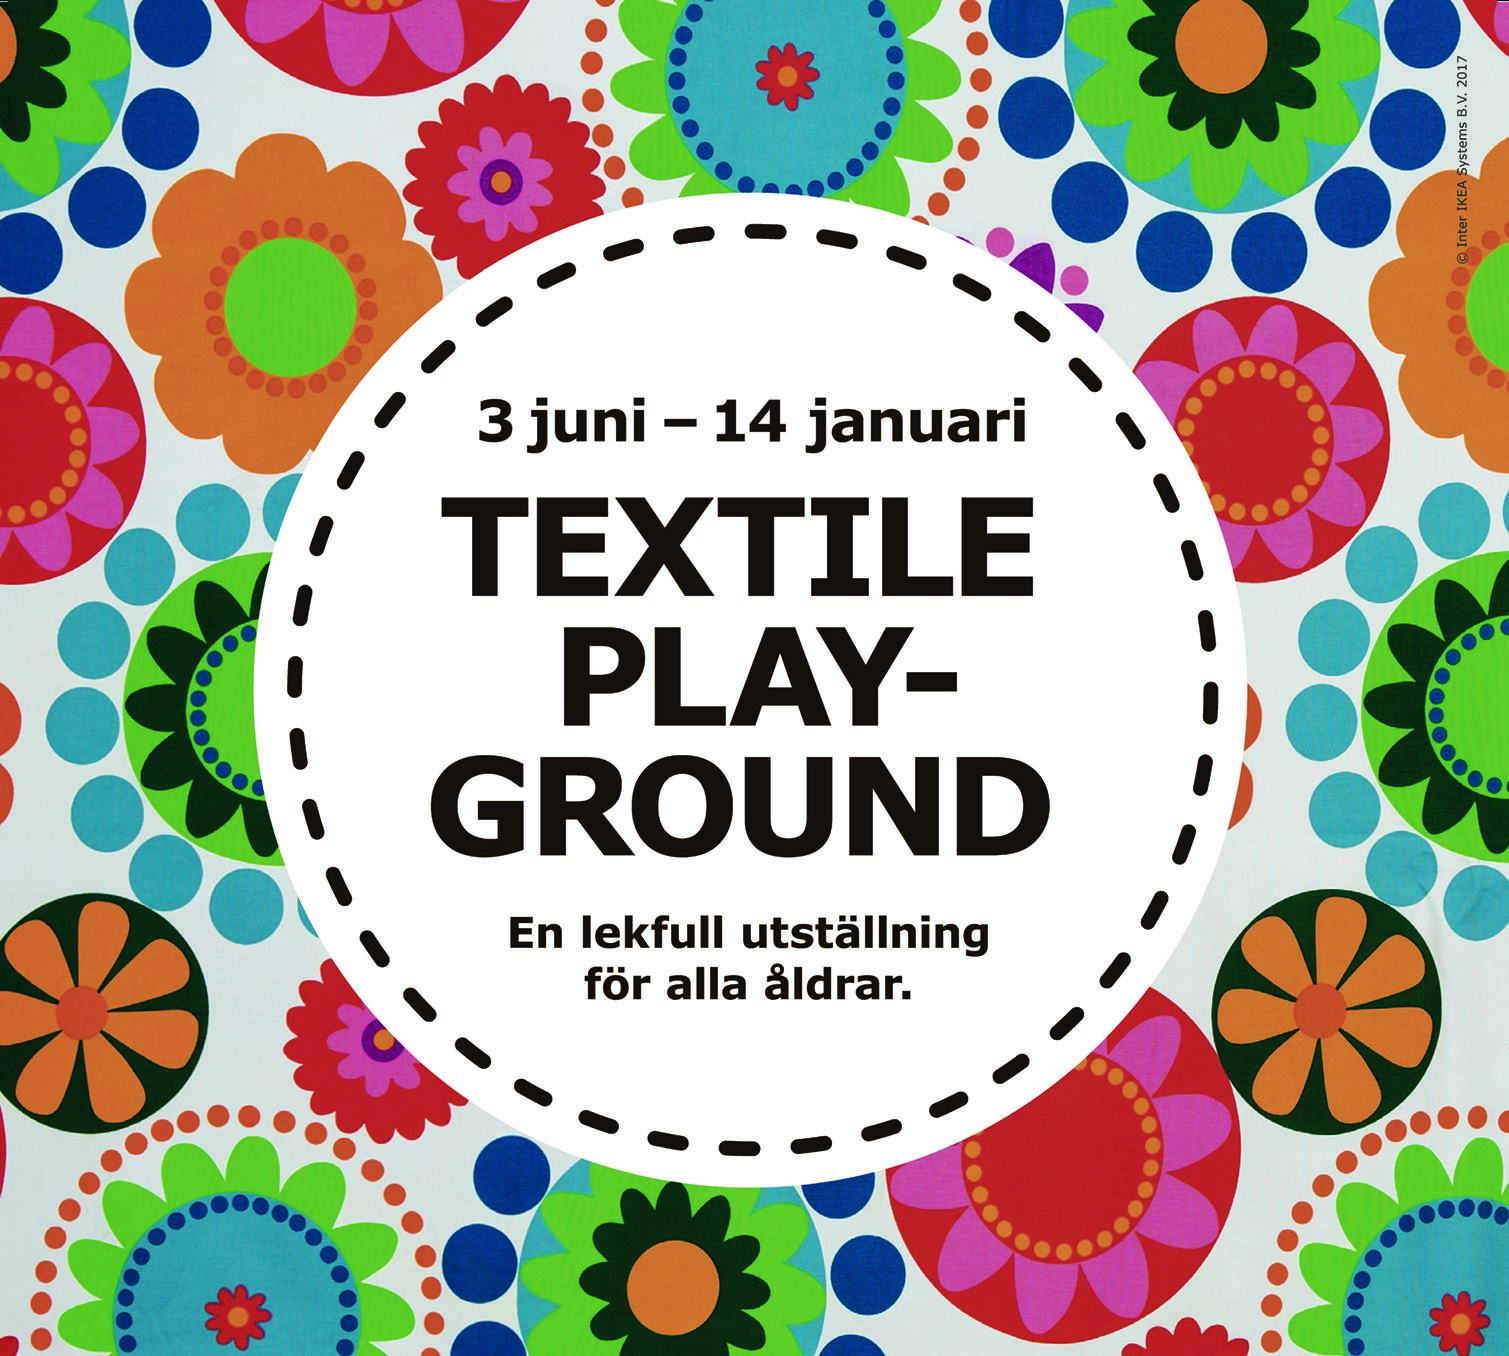 Exhibition - Textile Playground